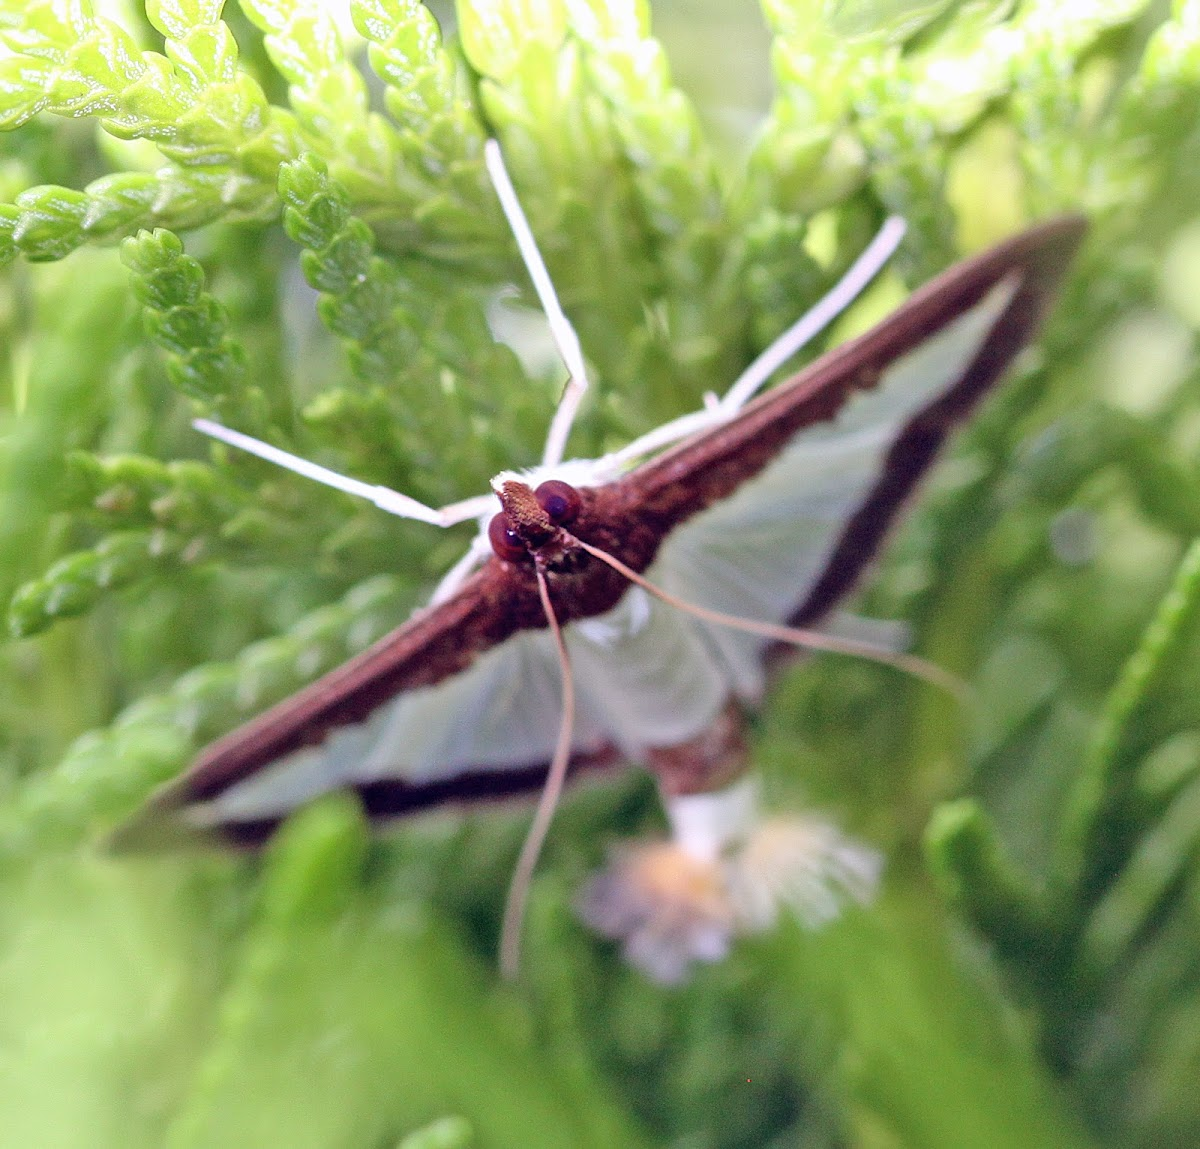 Cucumber Moth or Cotton Caterpillar